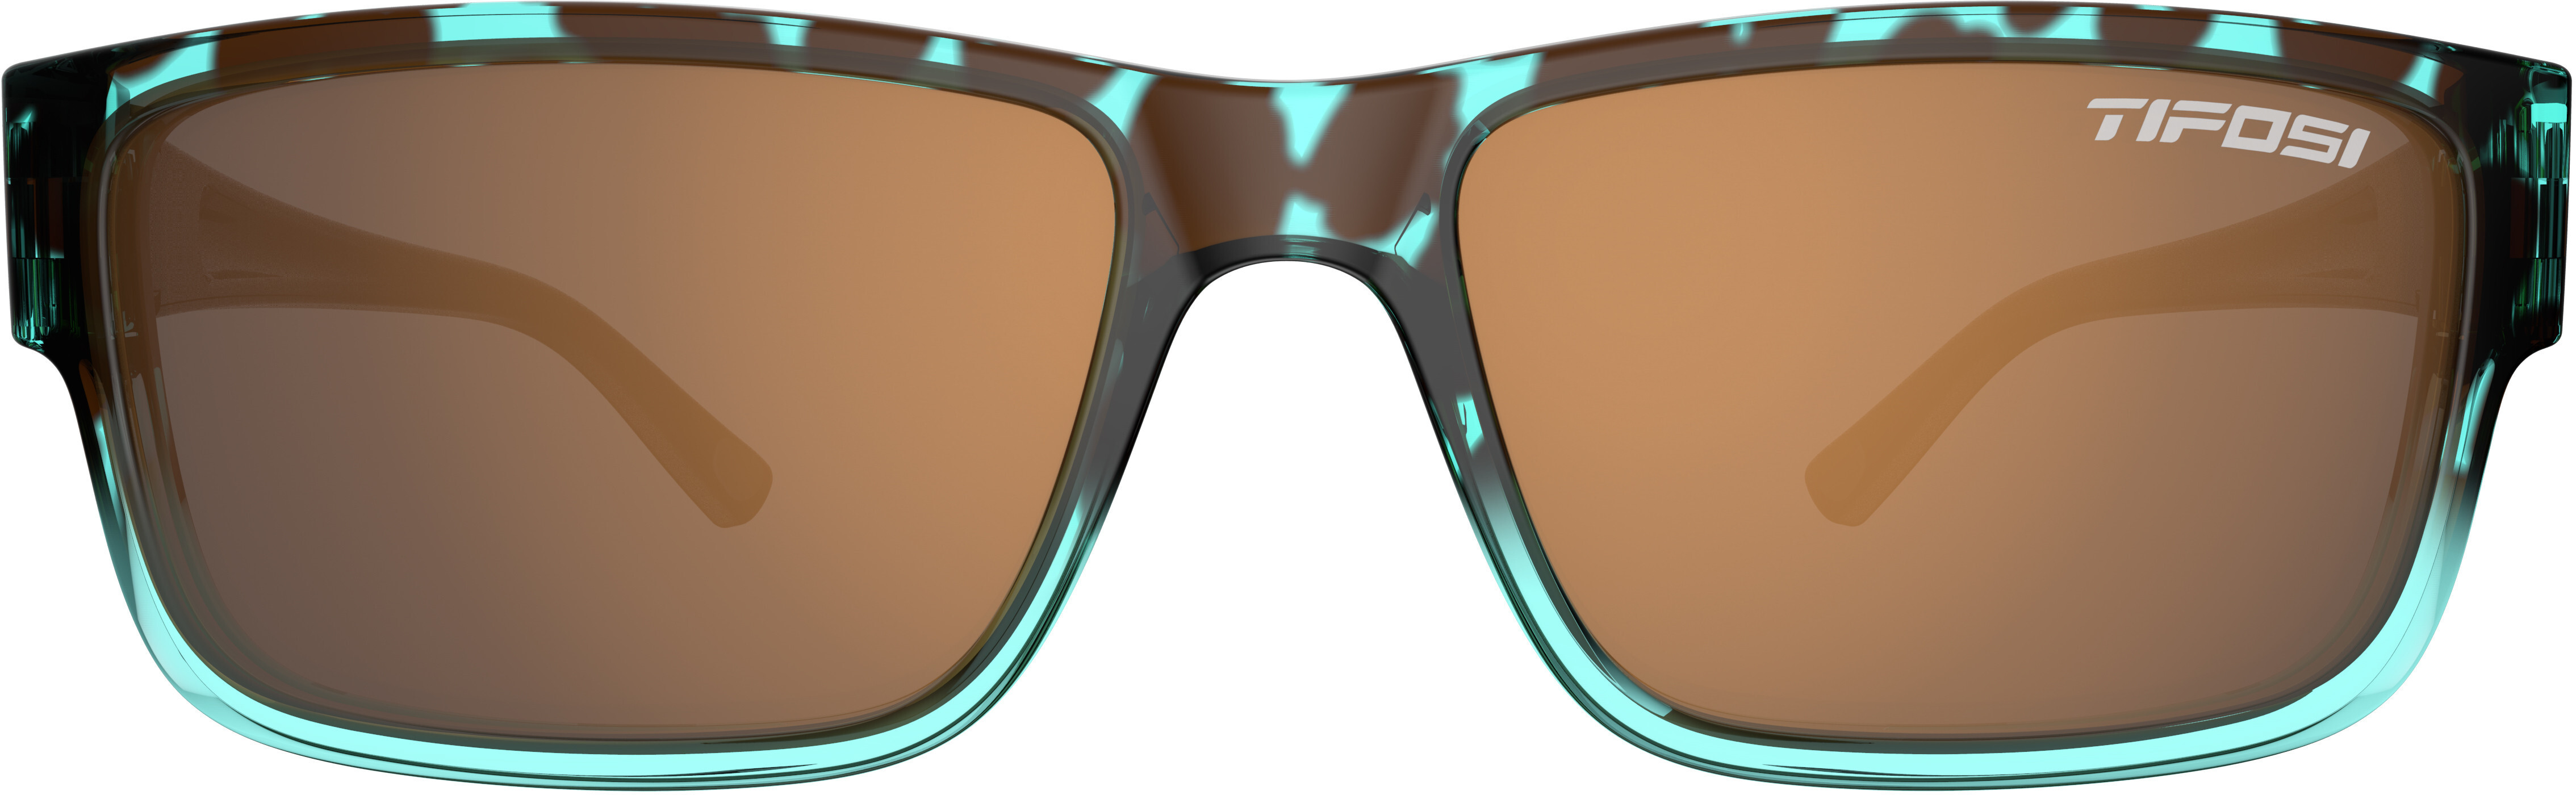 Tifosi Hagen 2 0 Glasses Blue Tortoise Brown Polarized